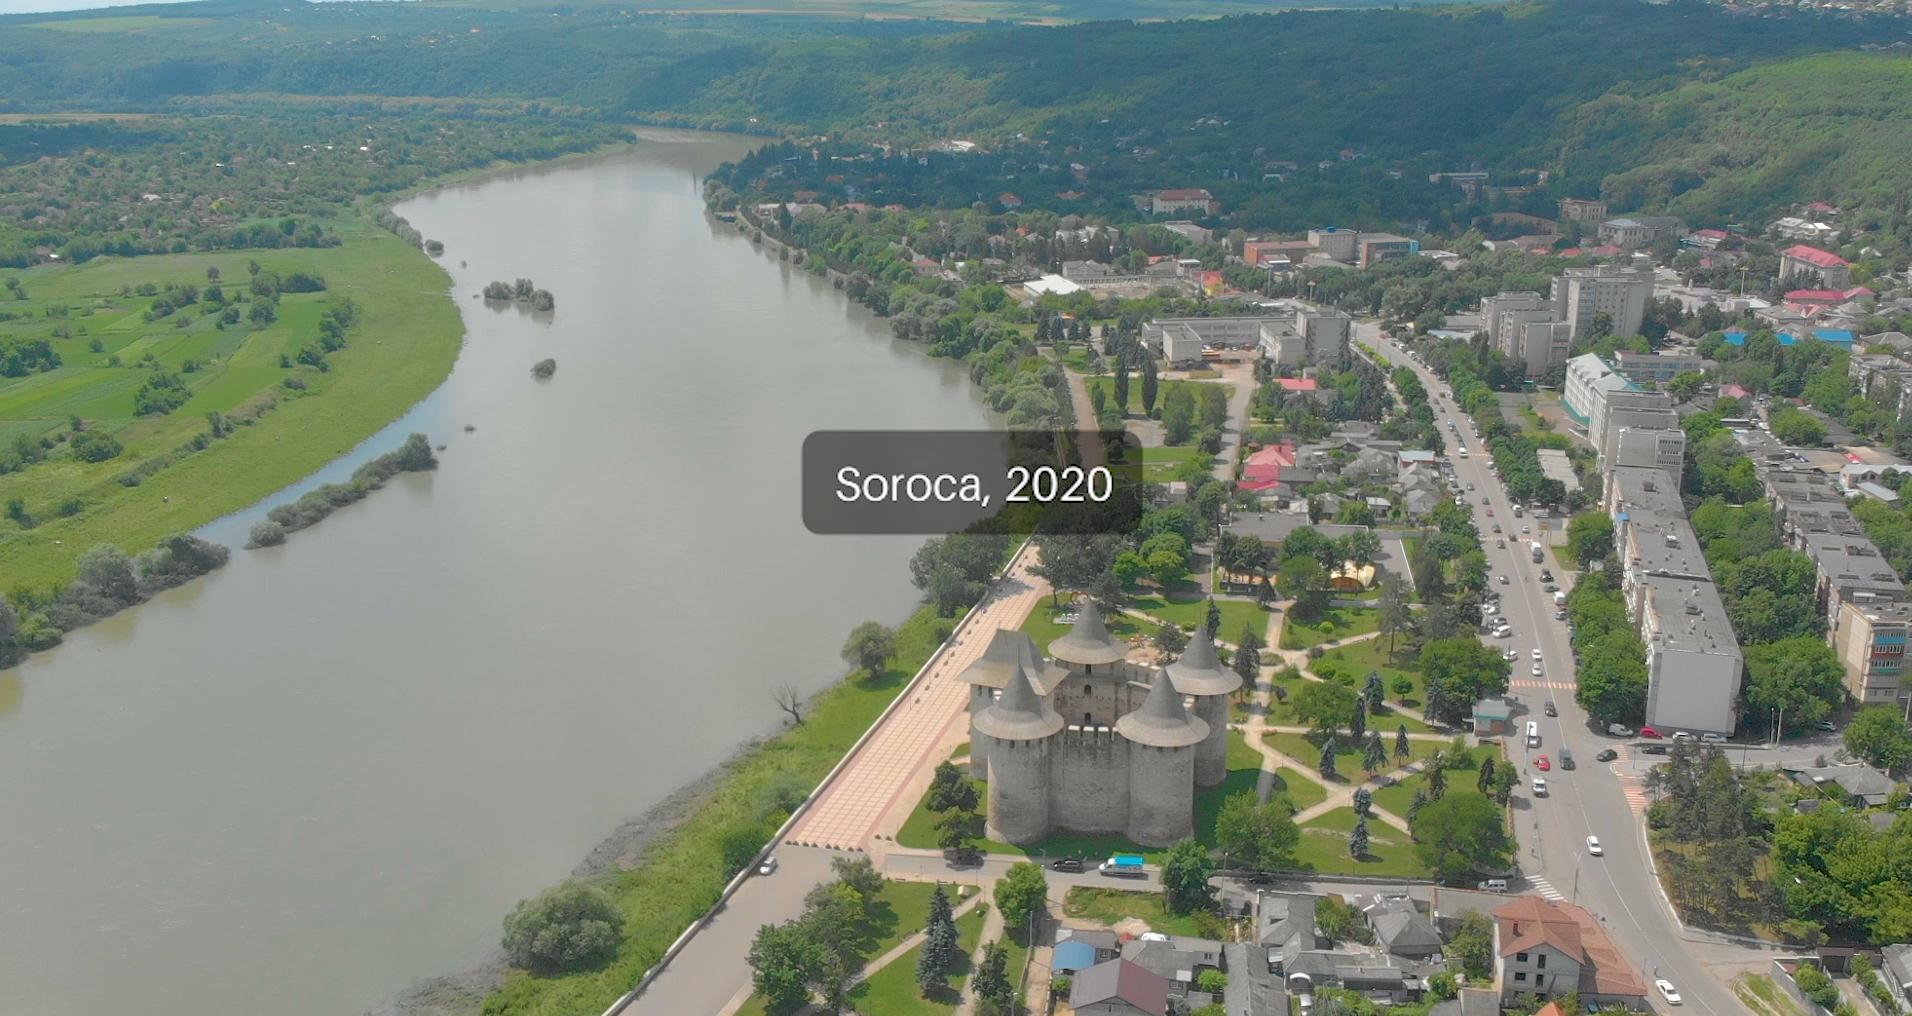 Orașul Soroca (nordul Republicii Moldova). FOTO: Ana Sârbu